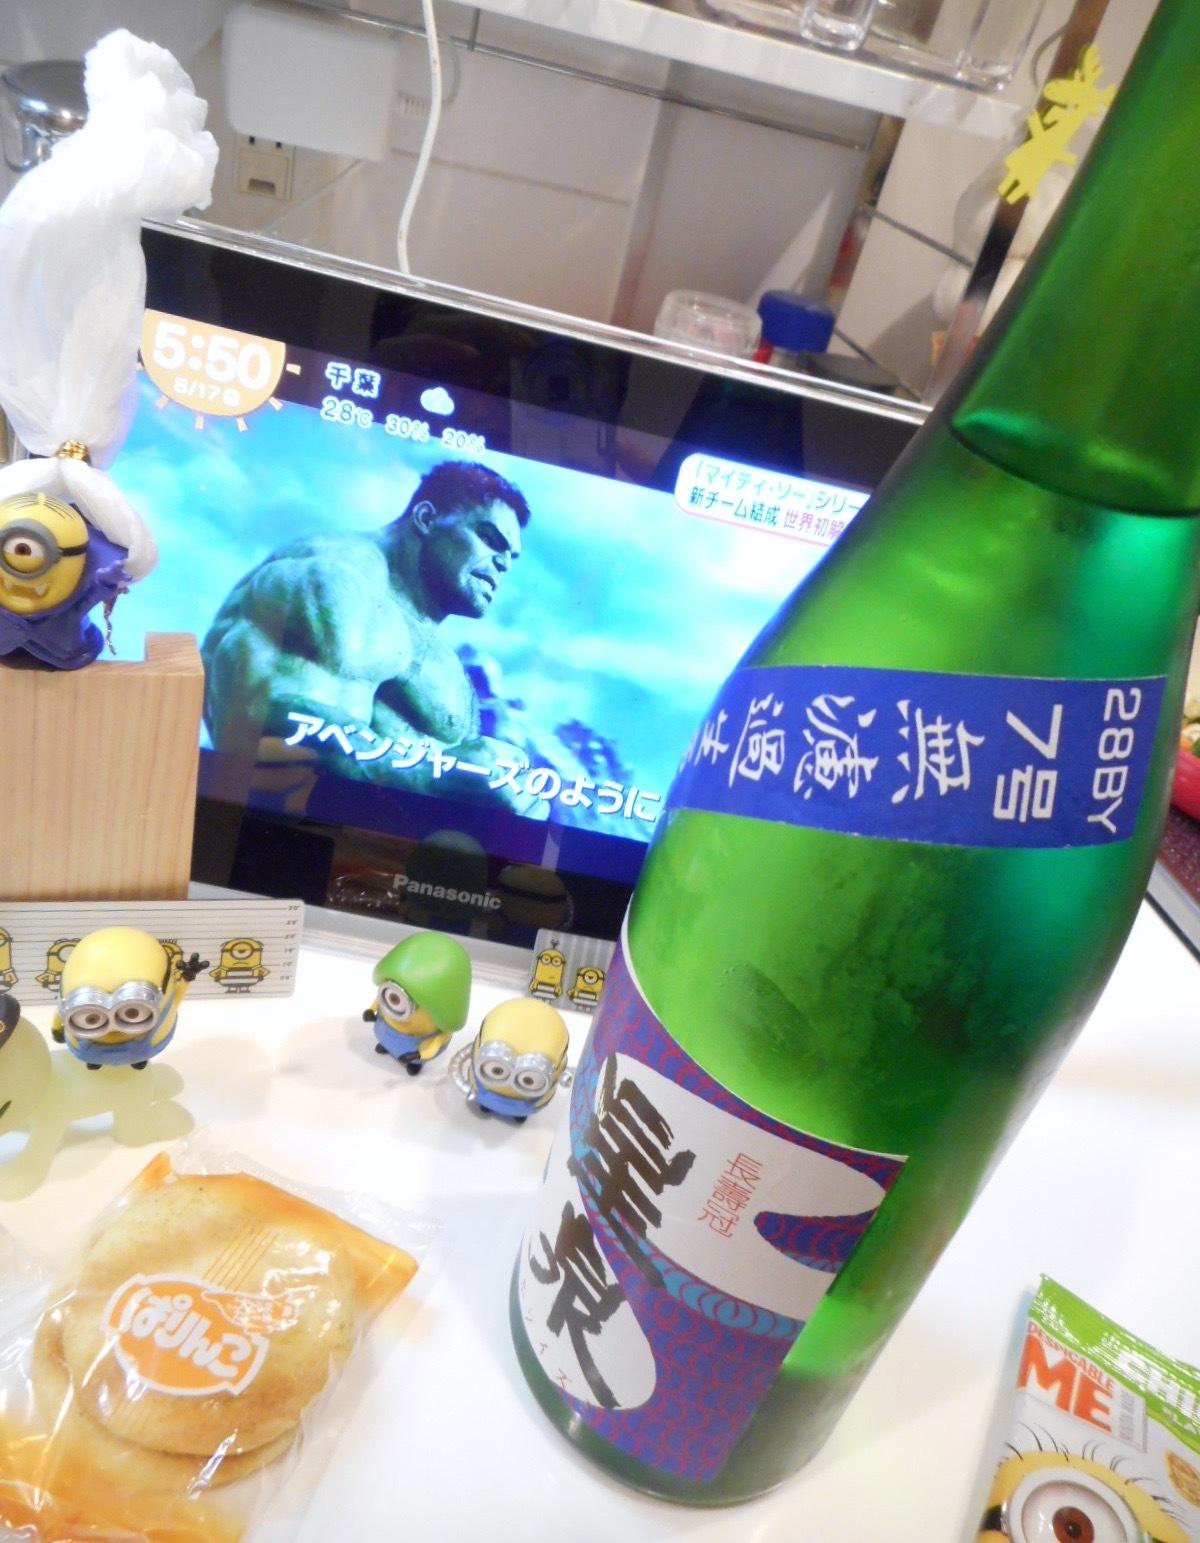 hoshiizumi_jungin7_28by3.jpg